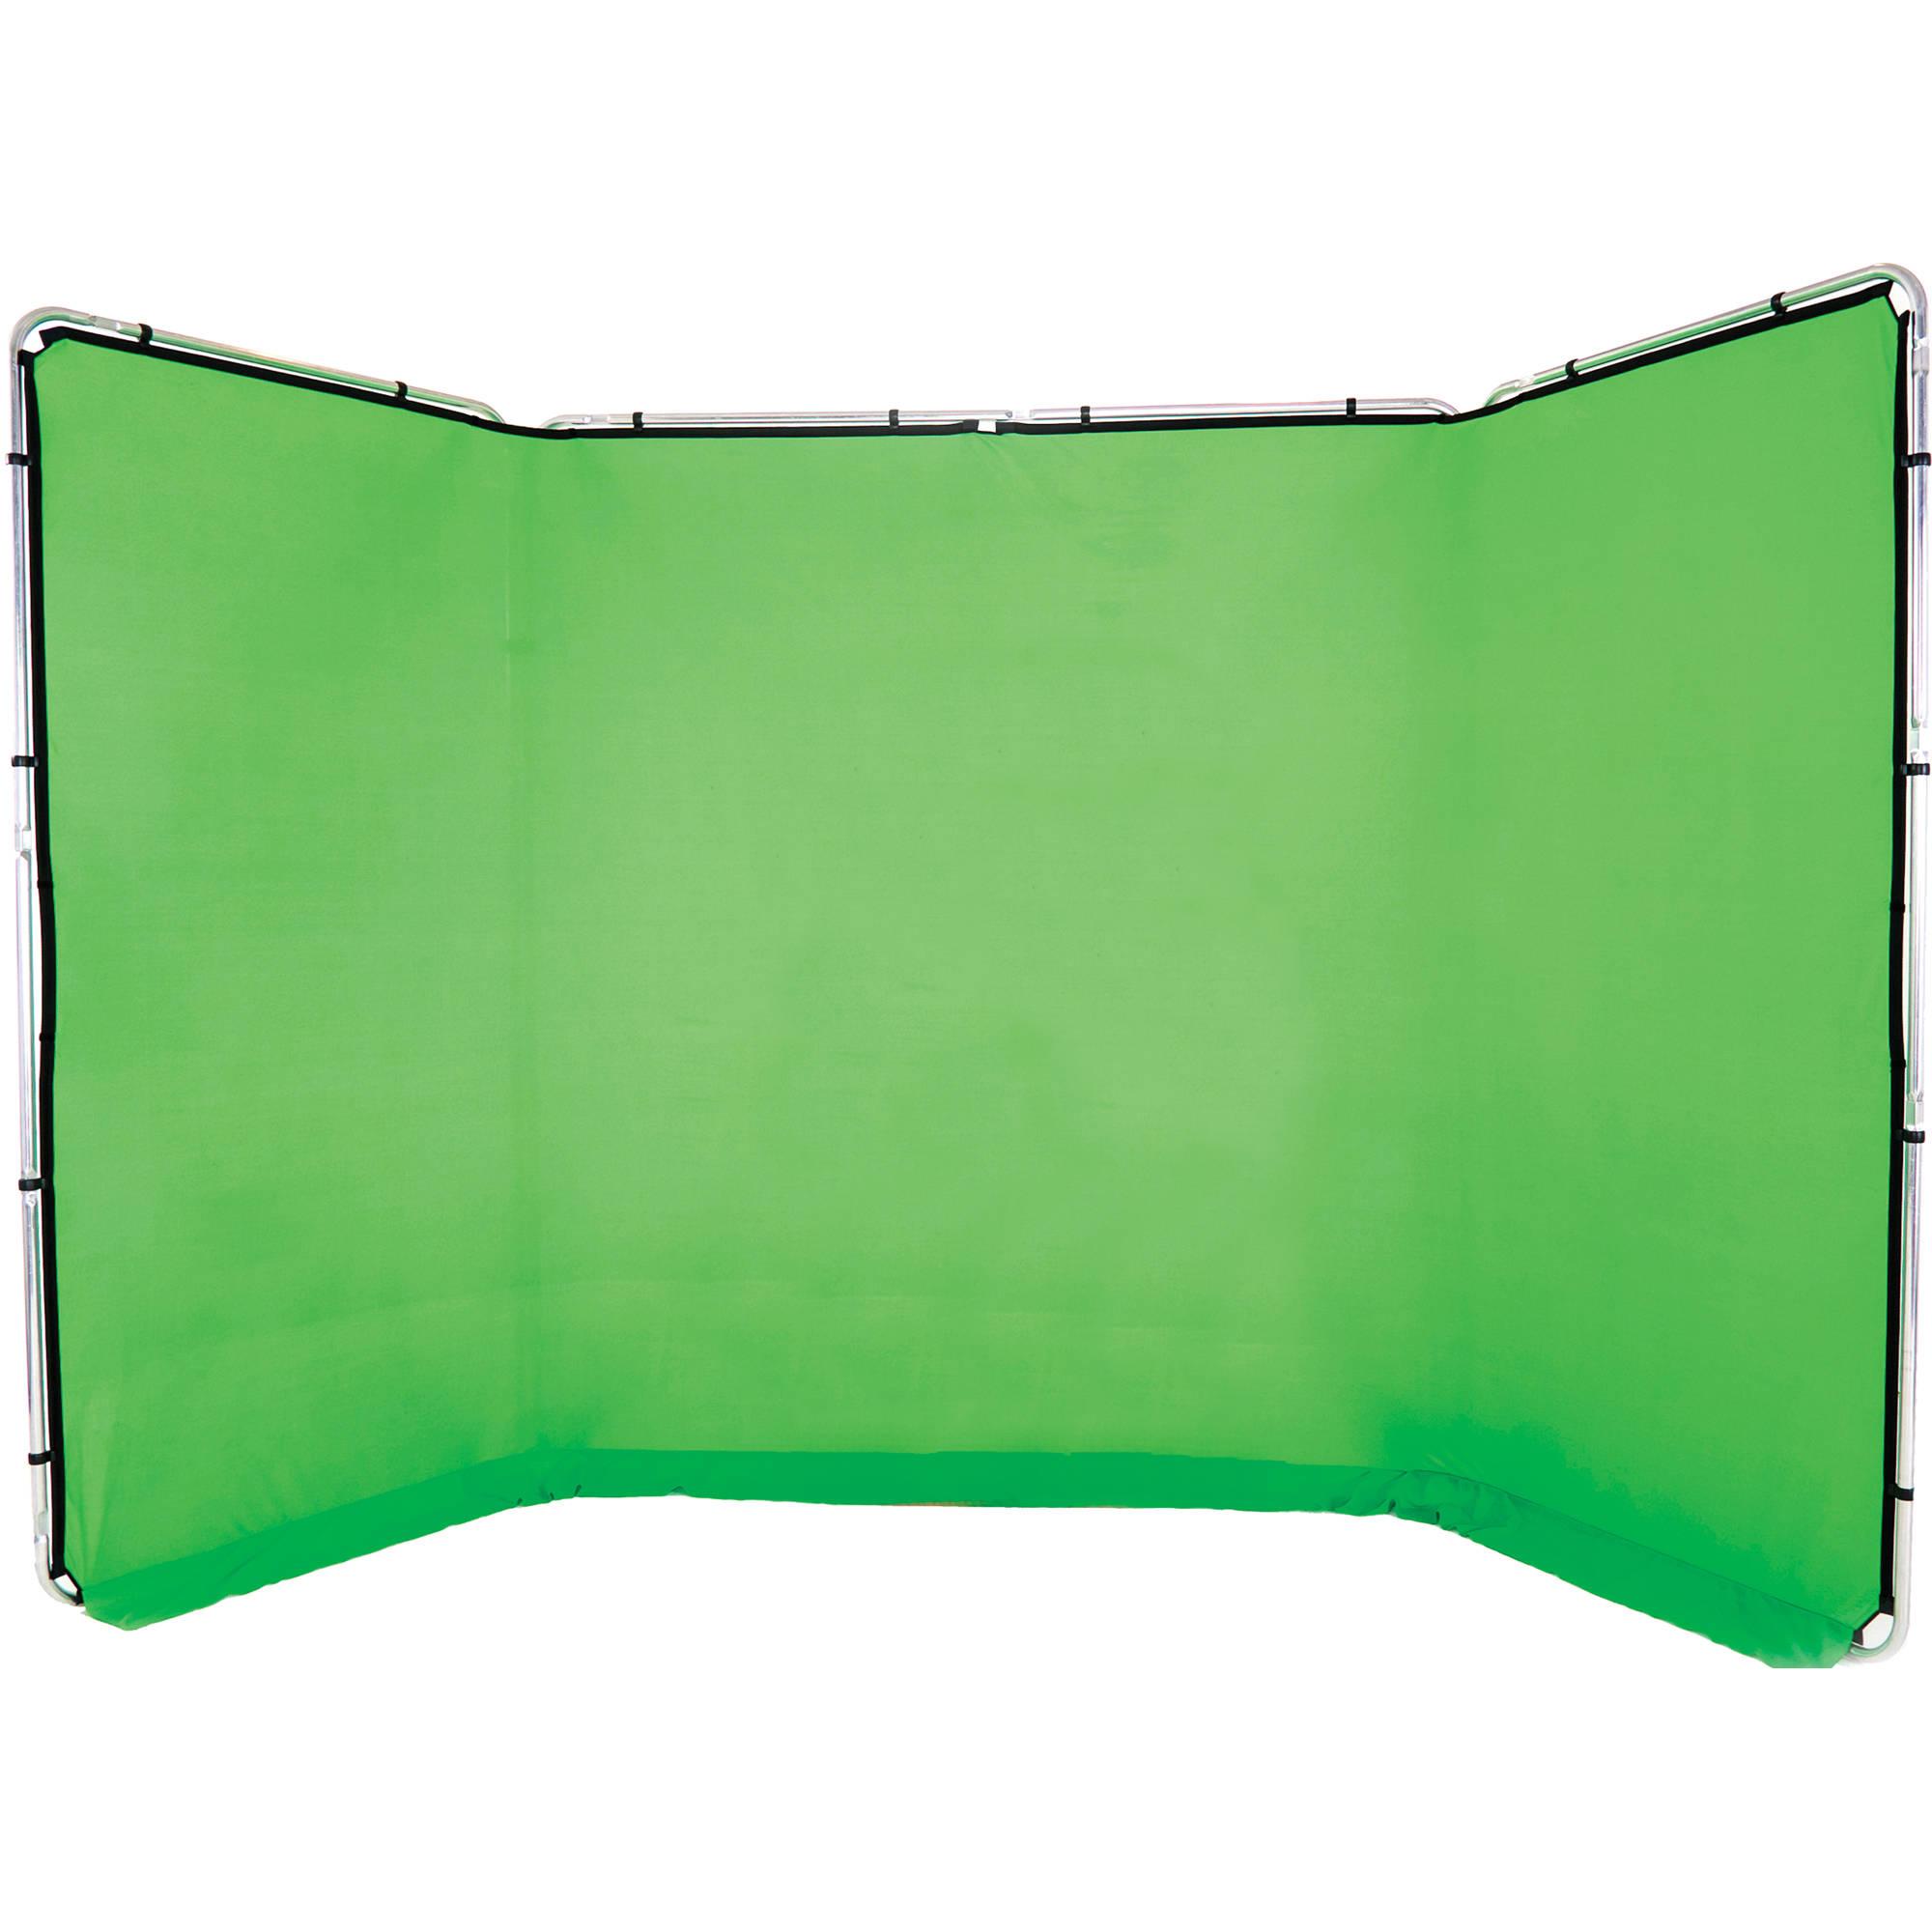 Lastolite panoramic background 13 chromakey green ll lb7622 lastolite panoramic background 13 chromakey green voltagebd Images